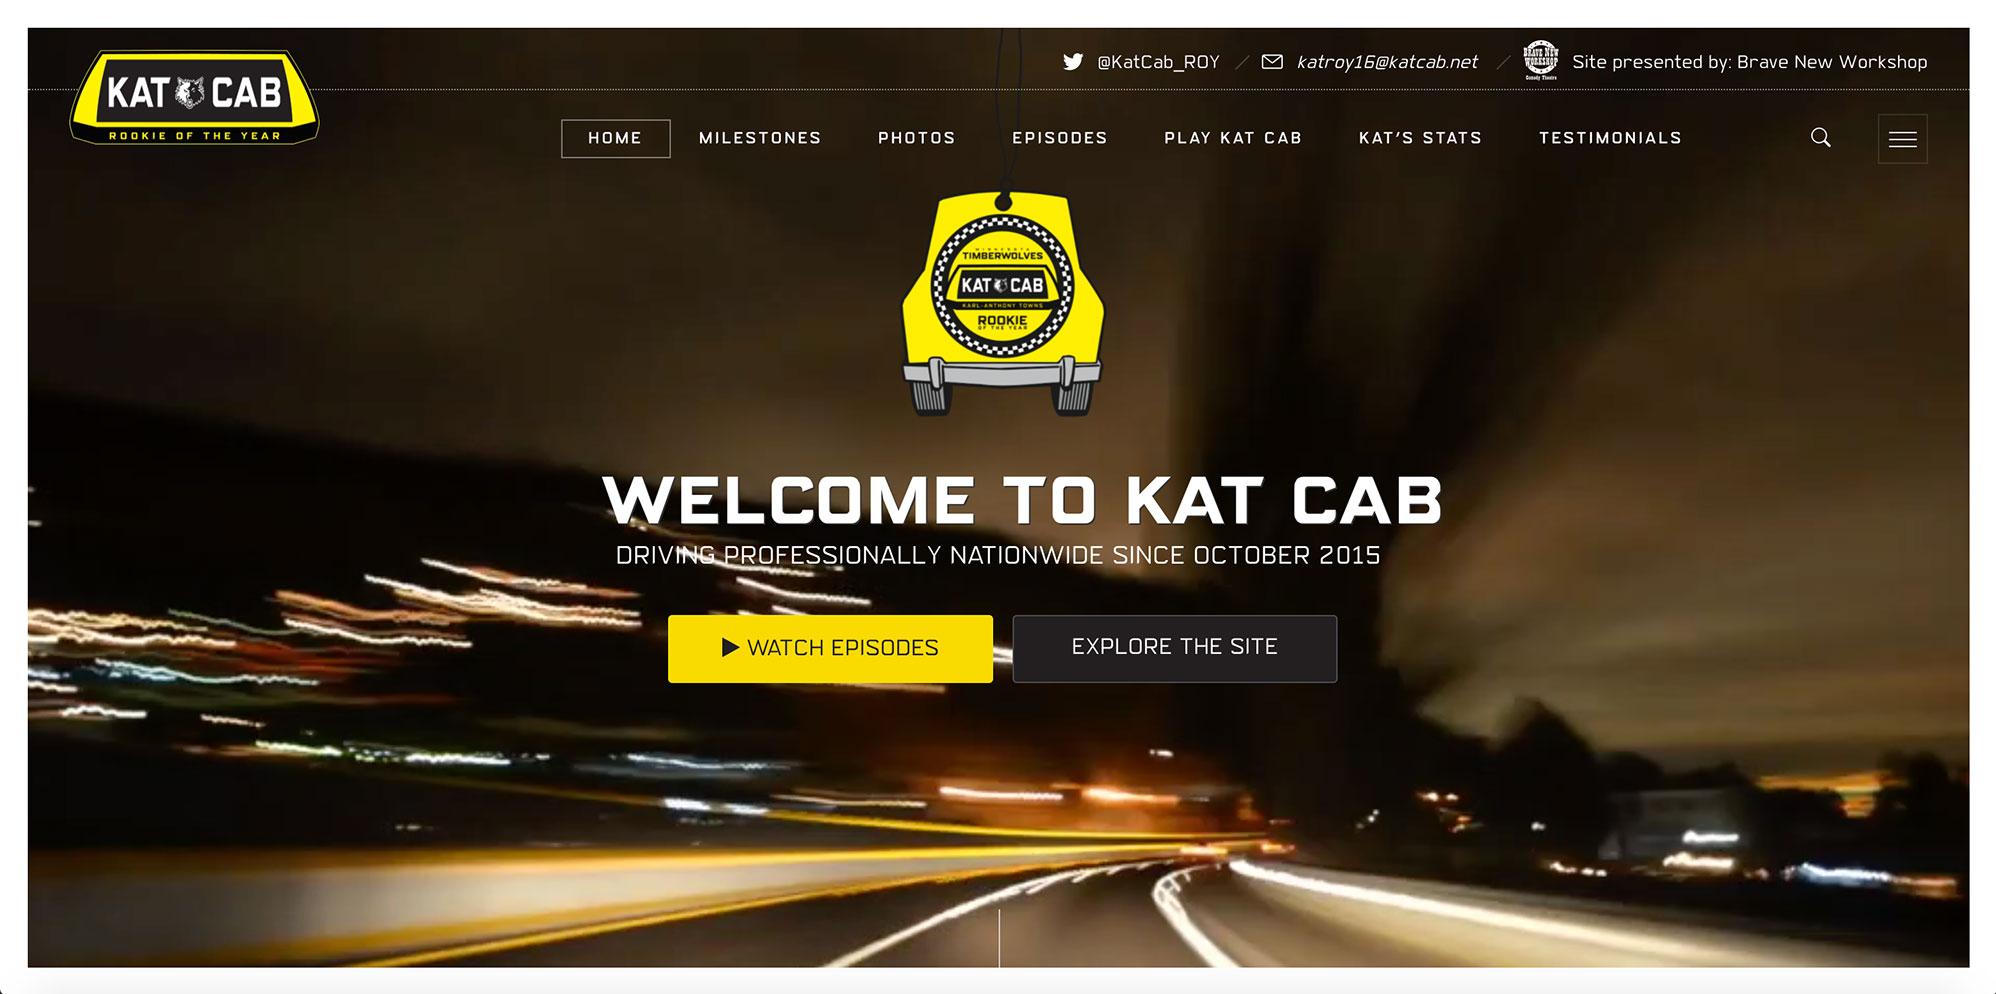 Kat Cab Hero Spot, Desktop View